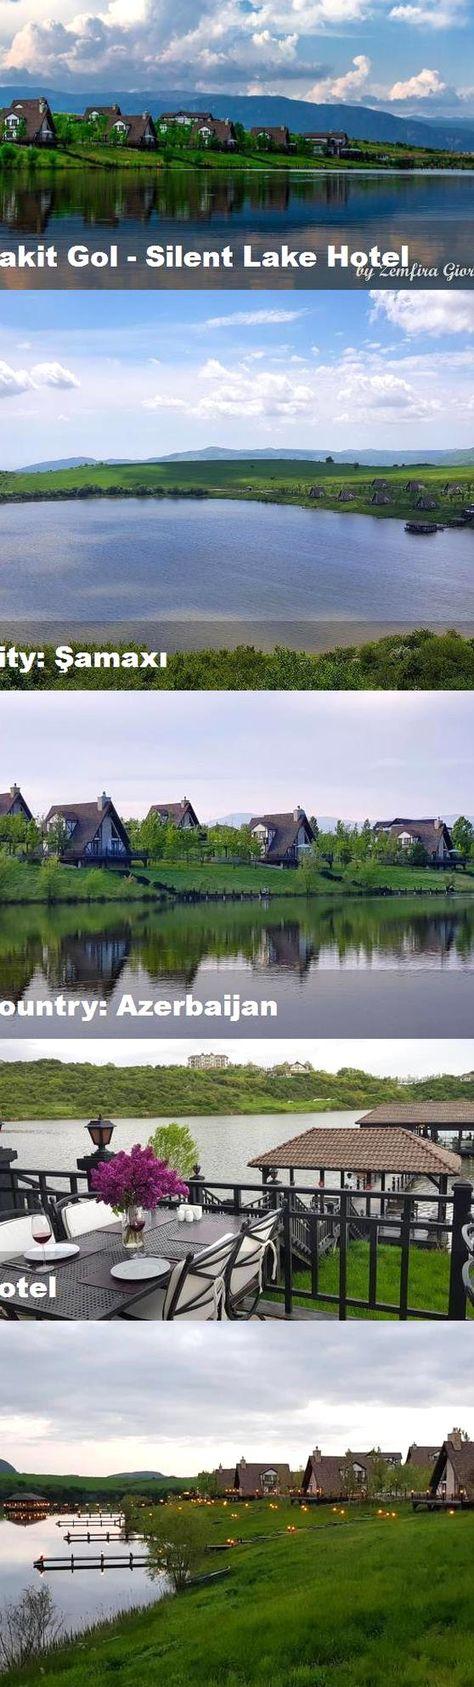 Sakit Gol Silent Lake Hotel City Amax Country Azerbaijan Hotel Lake Hotel Lake Hotel